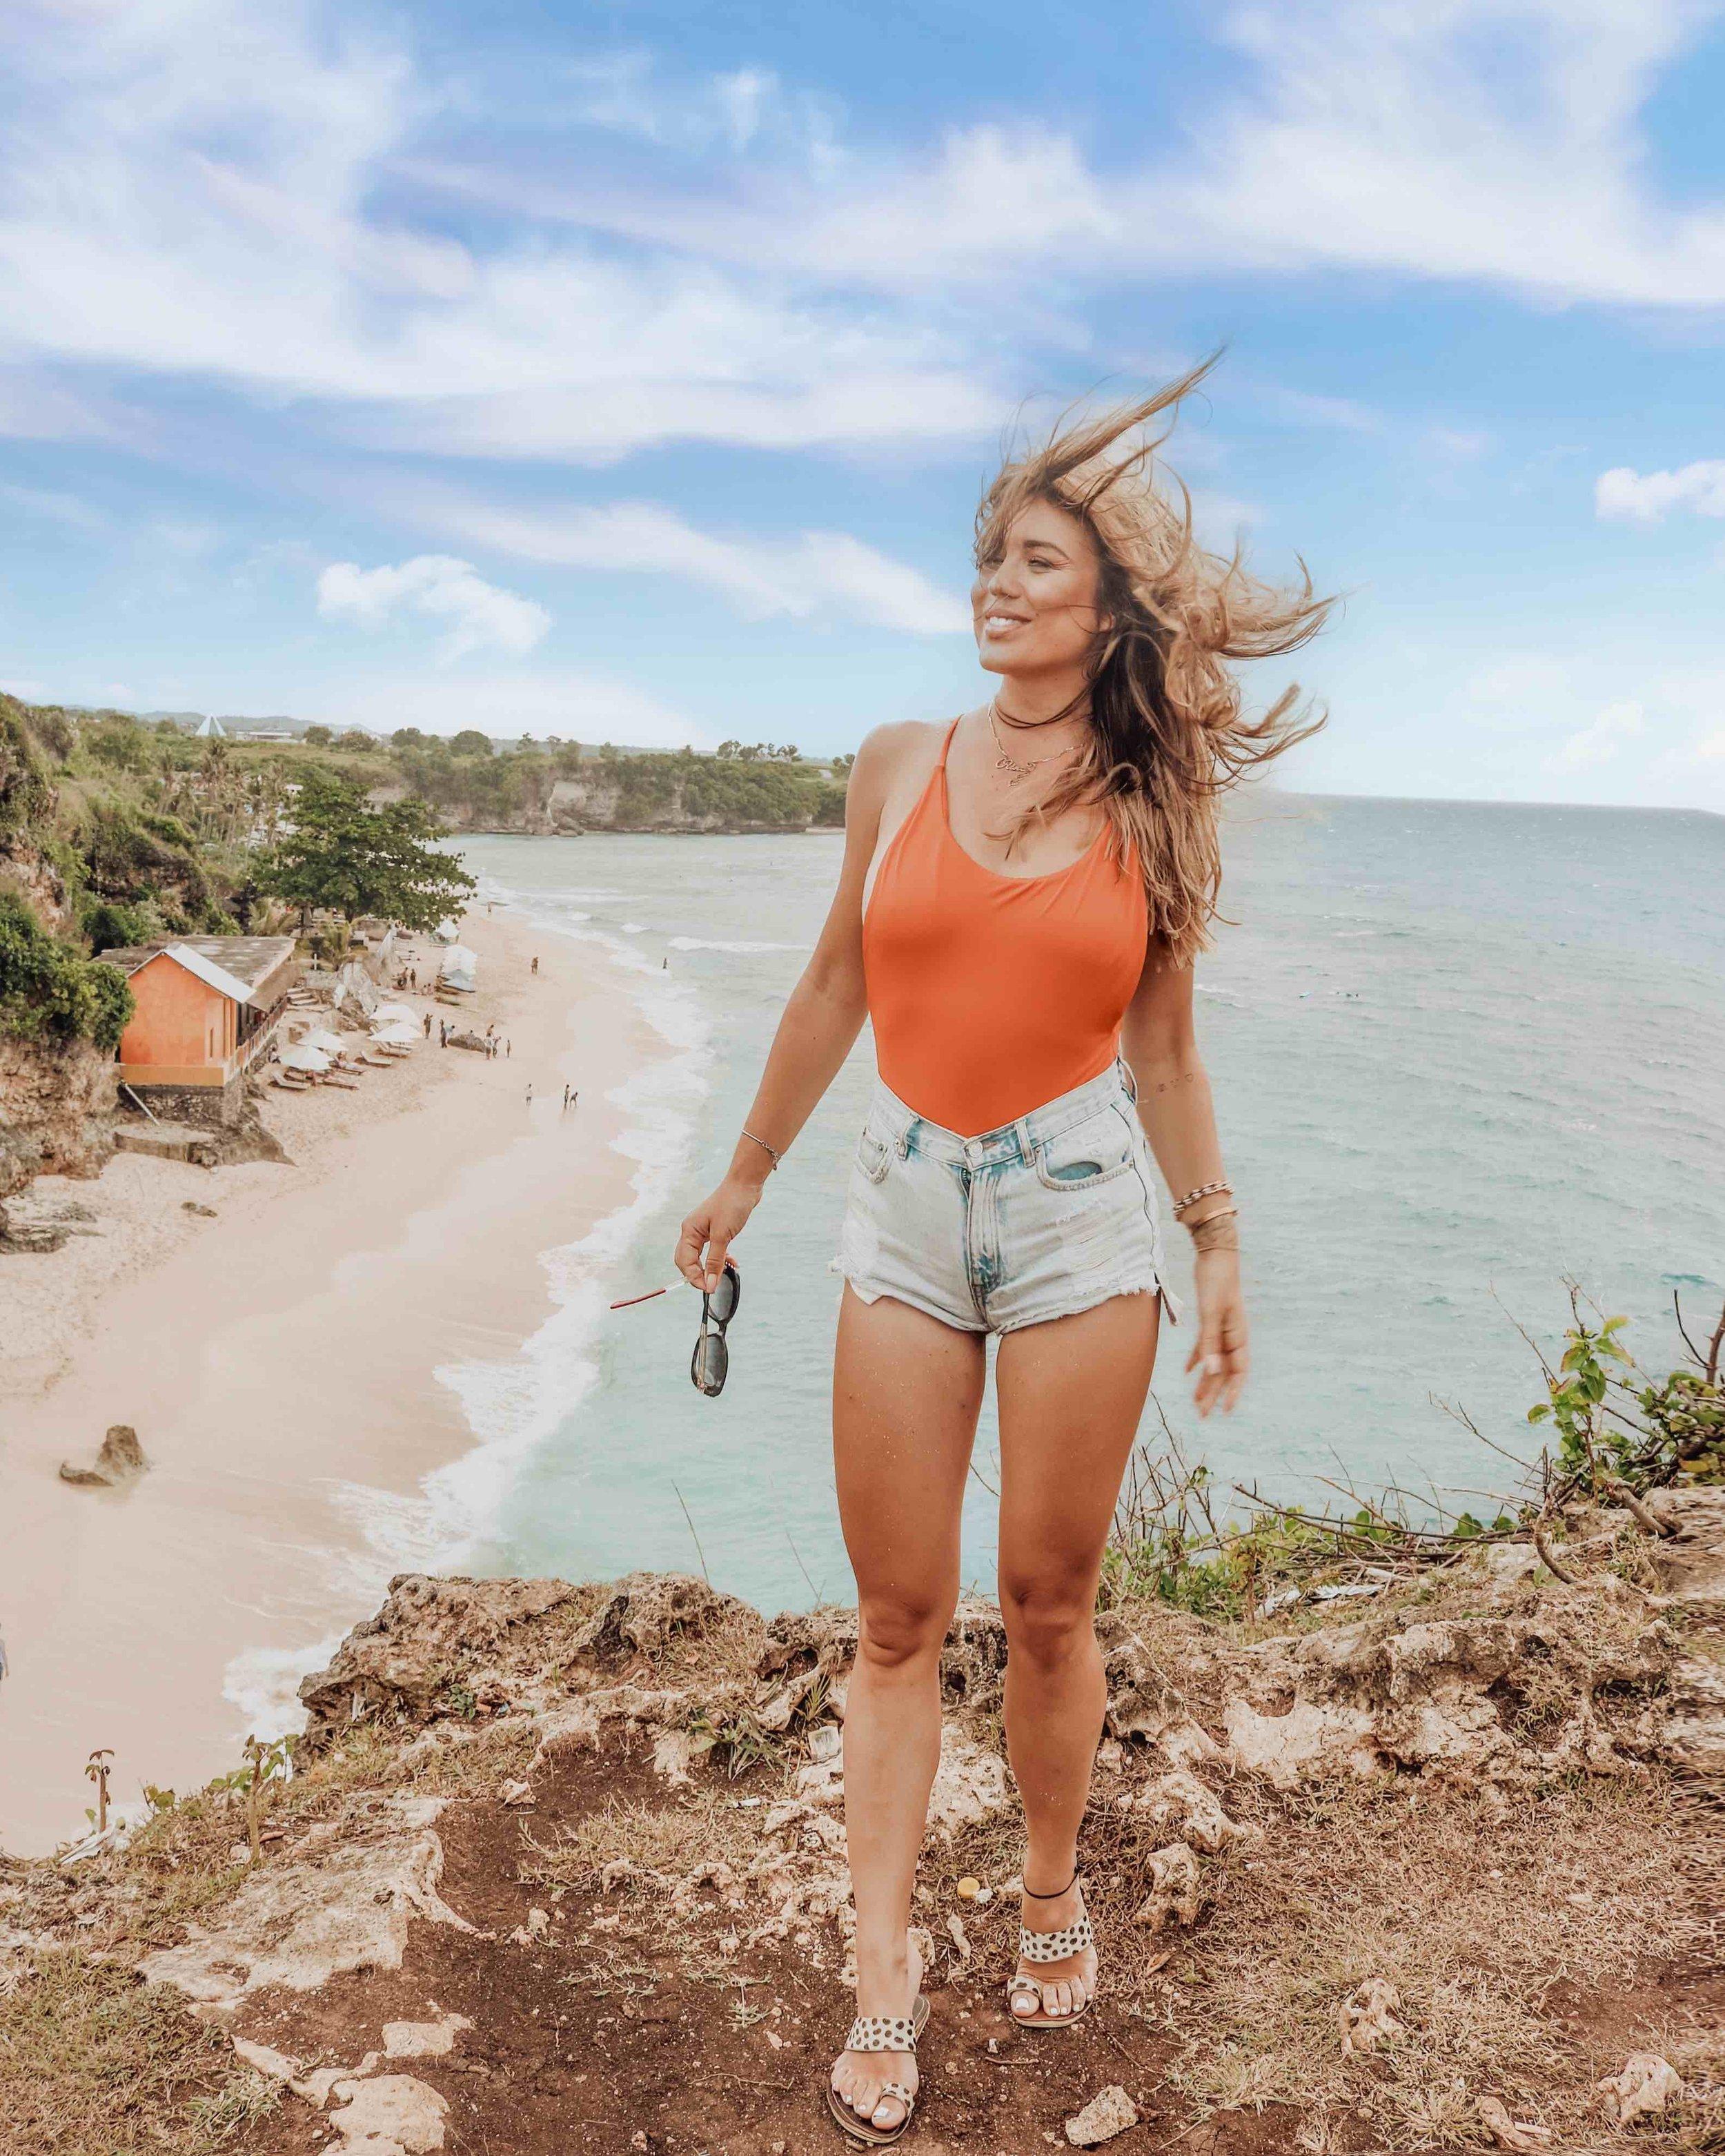 Balangan beach - Uluwatu